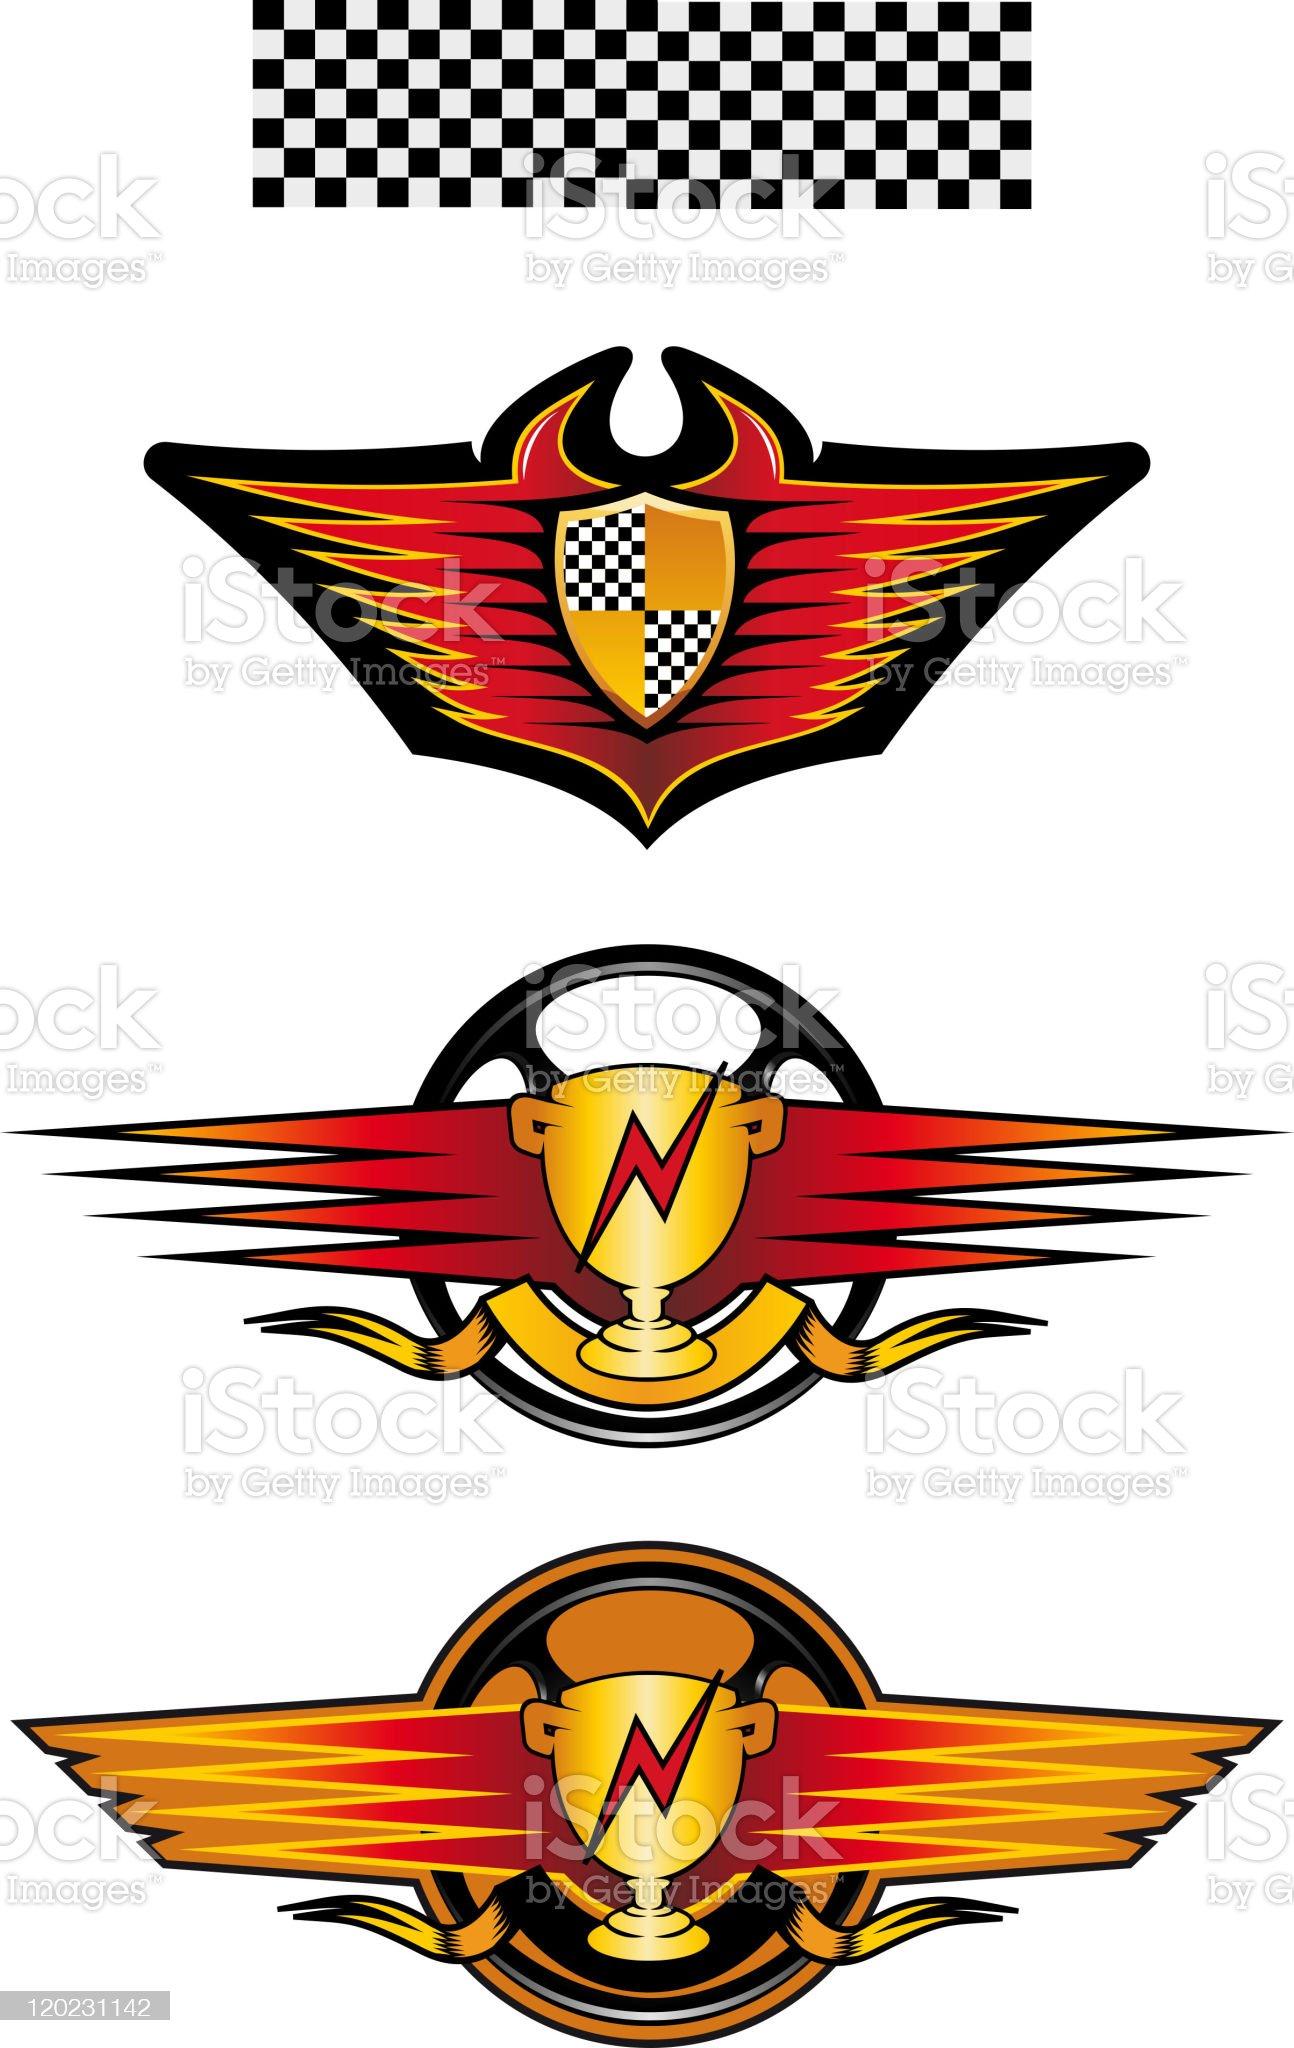 Racing symbols royalty-free stock vector art